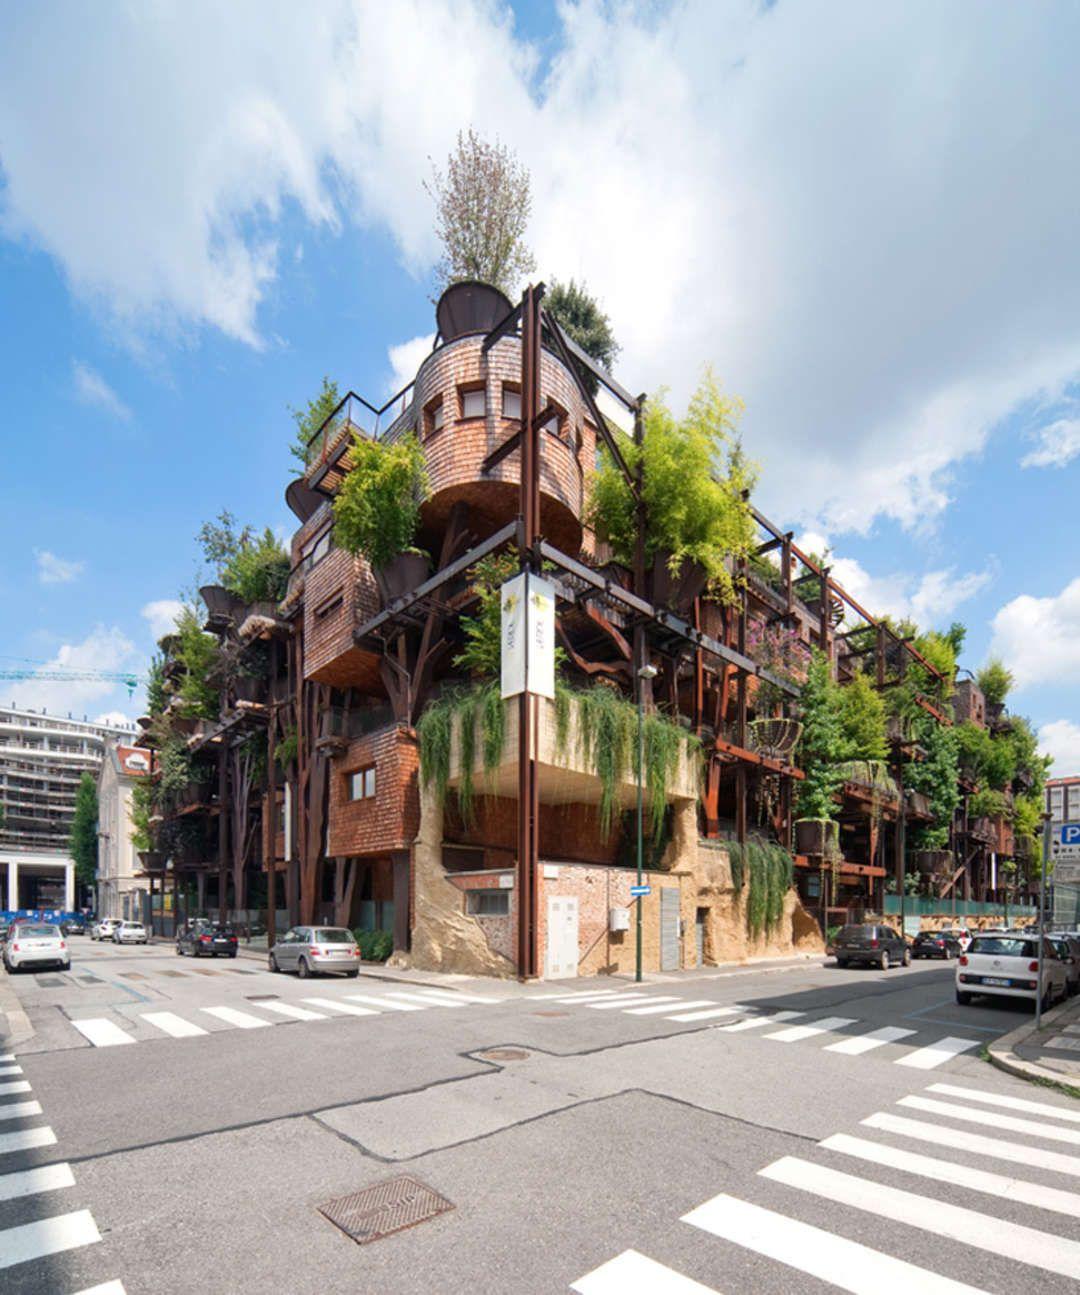 Image © Beppe Giardino Series Green Buildings